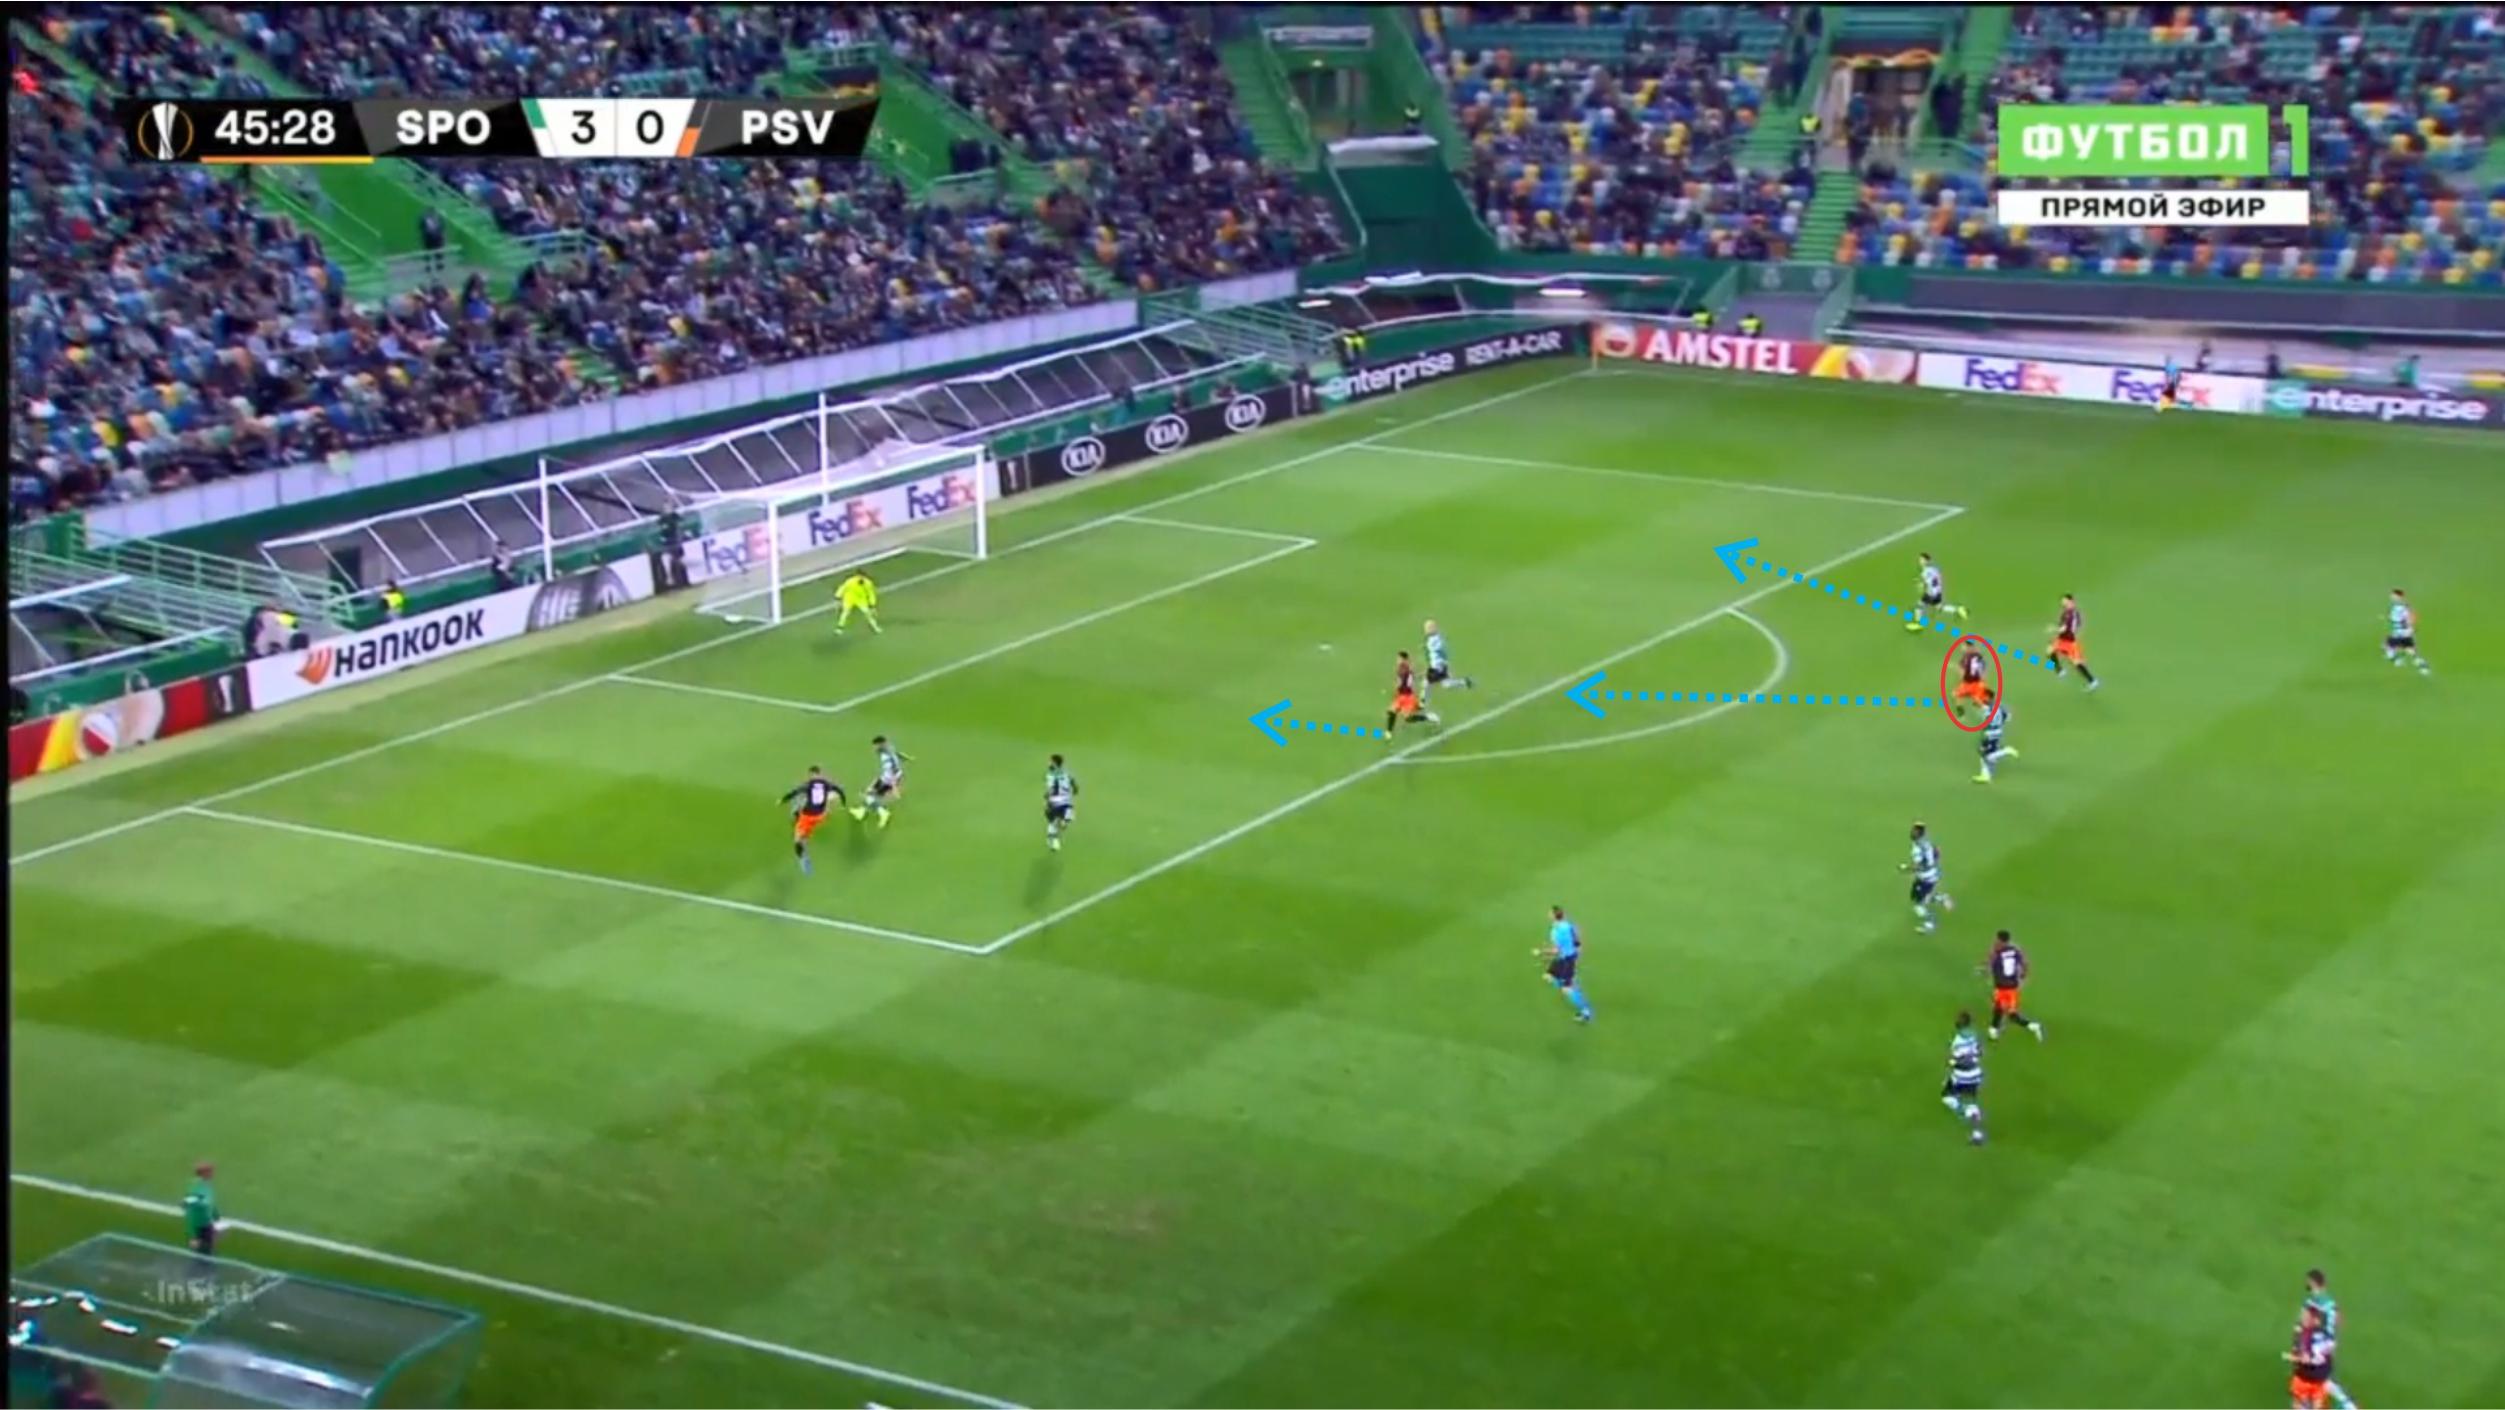 Mohamed Ihattaren 2019/20 - scout report tactical analysis tactics